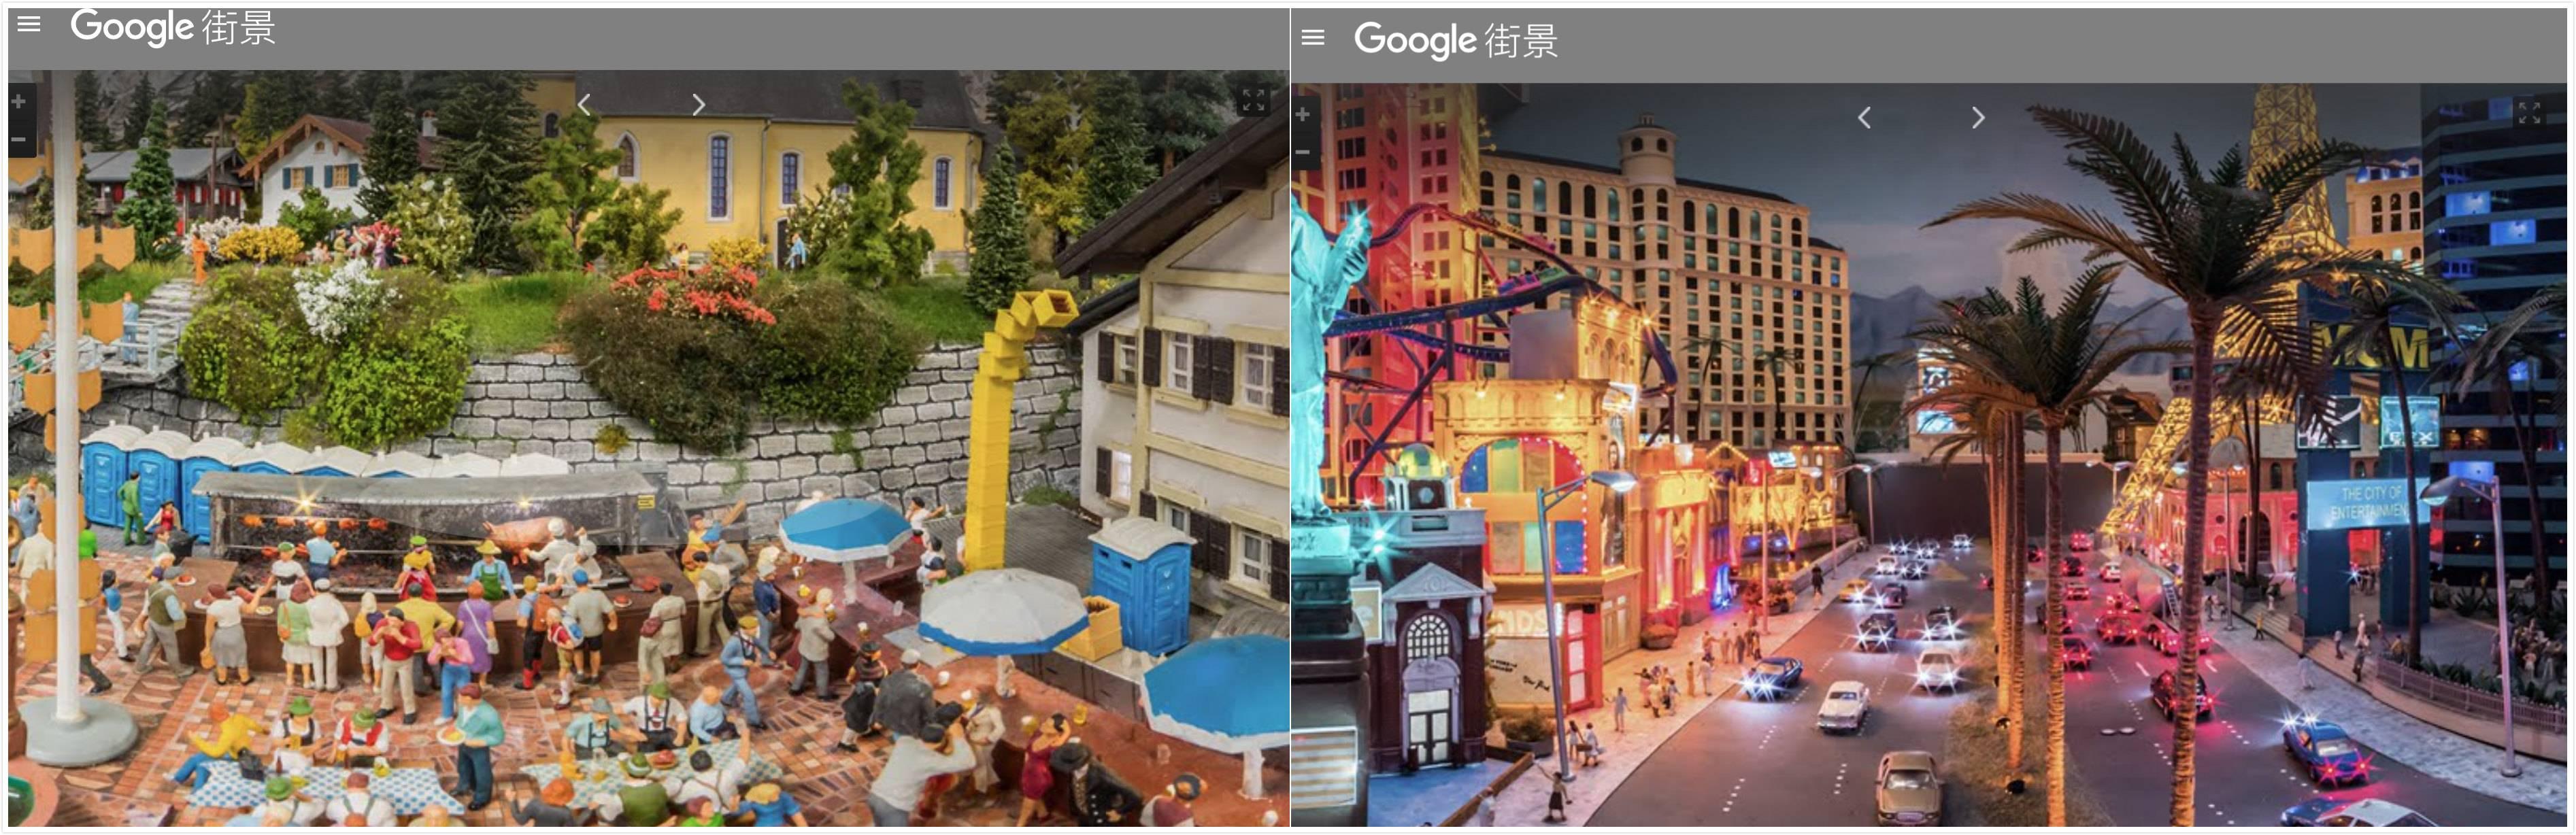 google-streep-view-miniature-1